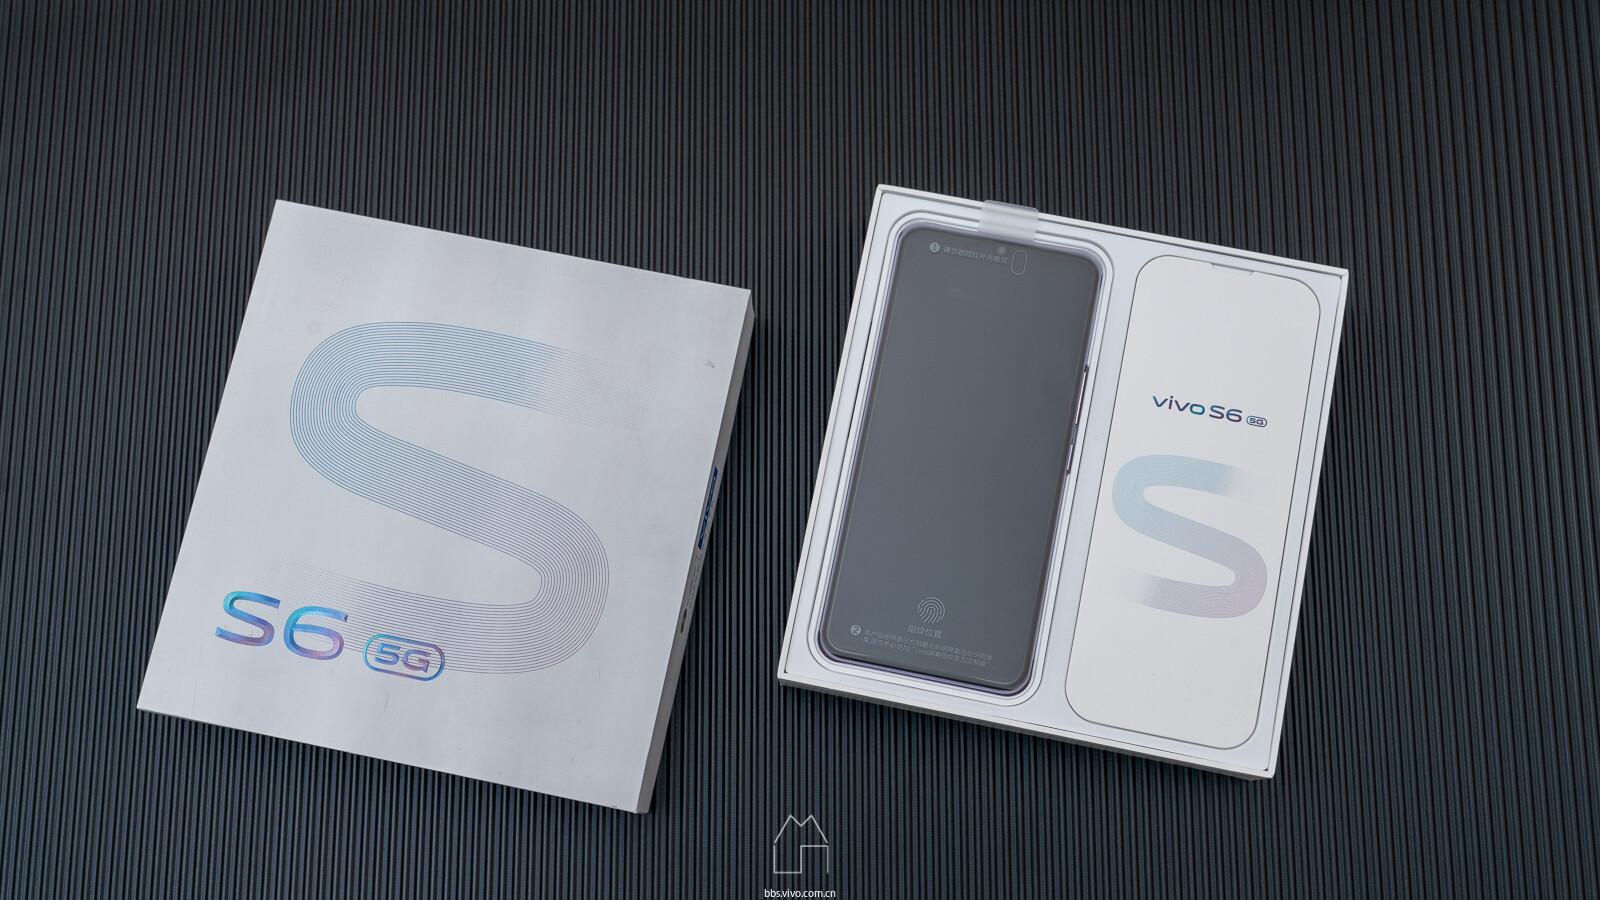 S6-003.jpg